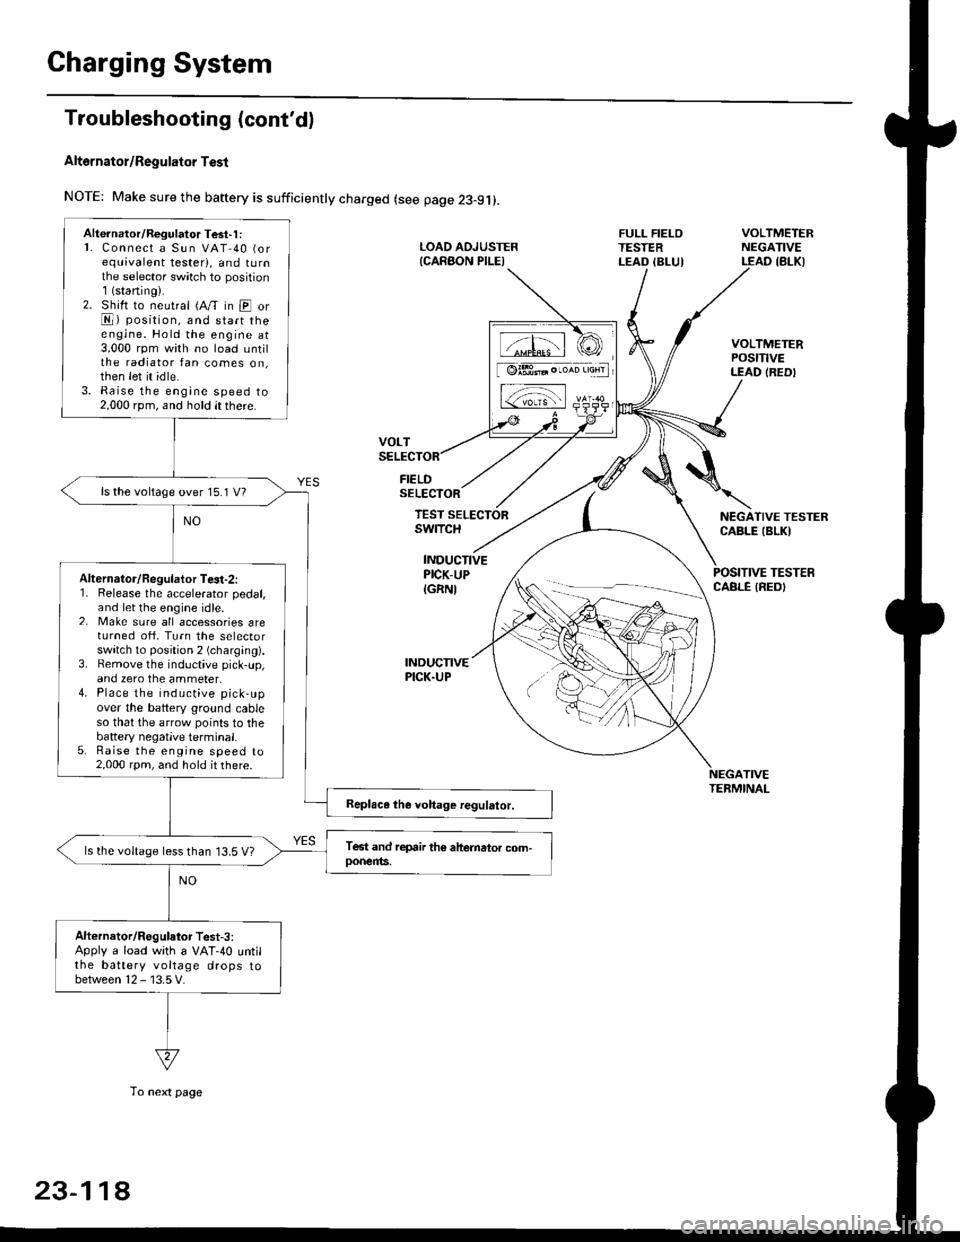 honda cr125r engine wiring diagram honda fender diagram honda cr125r engine wiring diagram #23